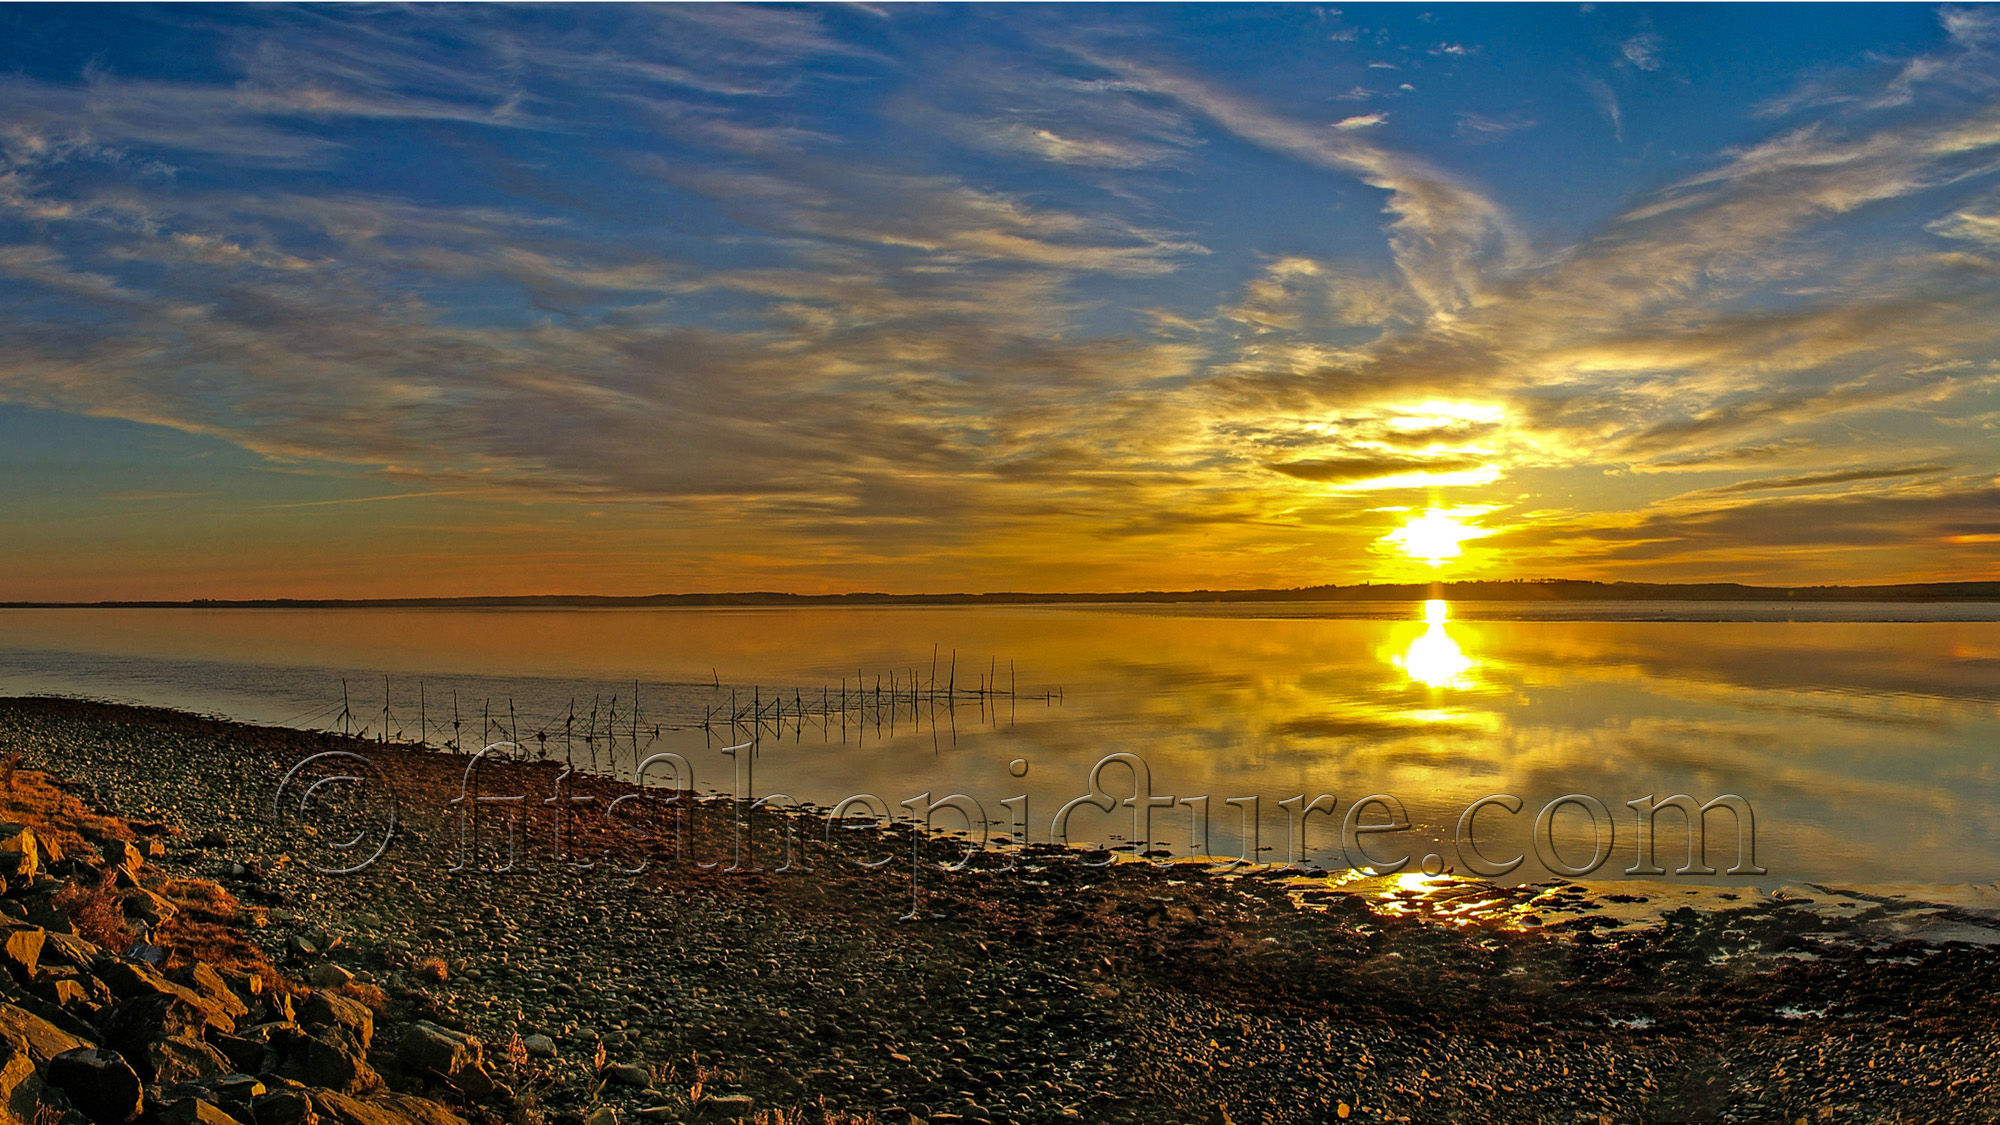 Cree Estuary salmon nets at sunset